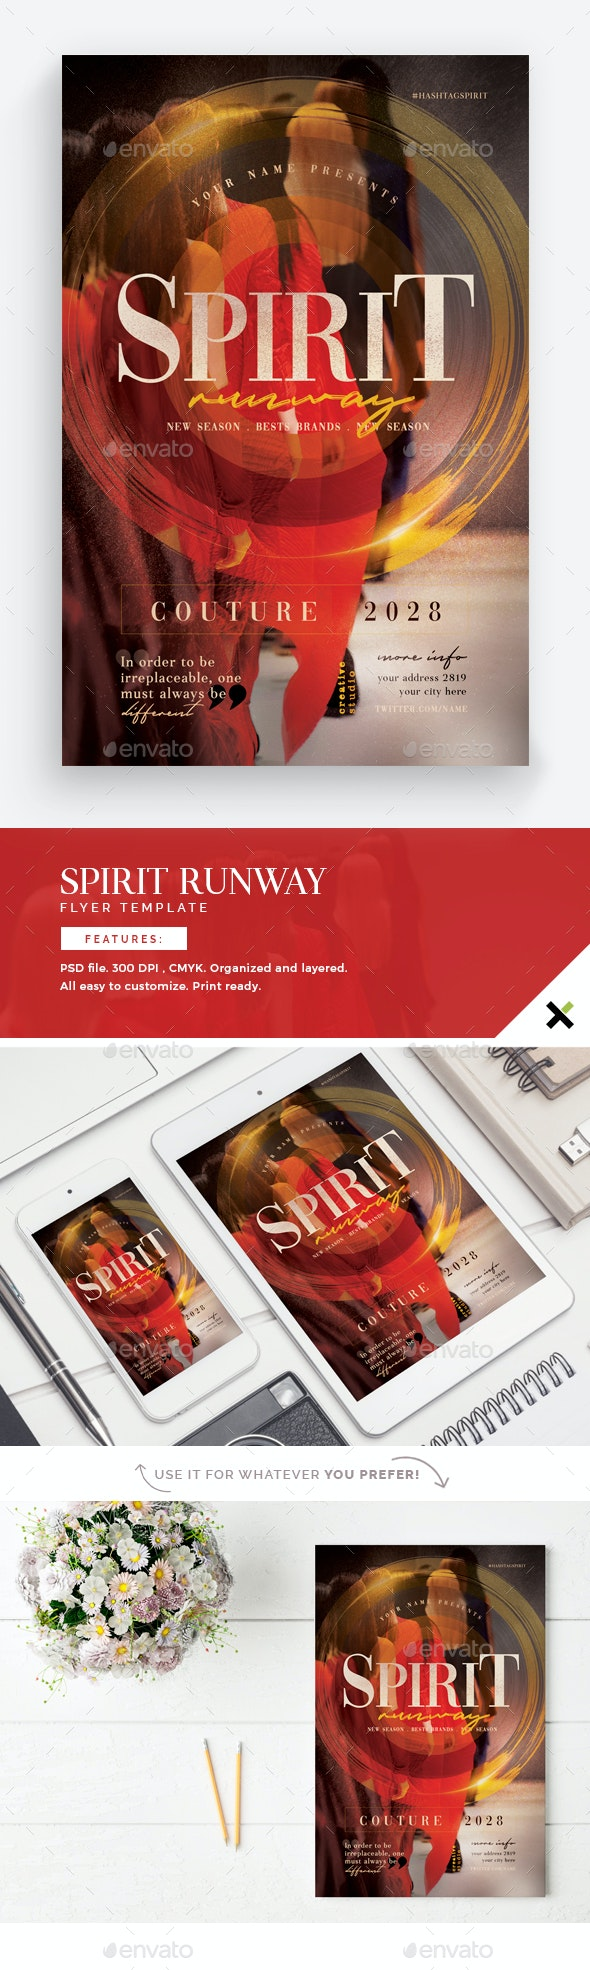 Spirit Runway Flyer Template - Events Flyers